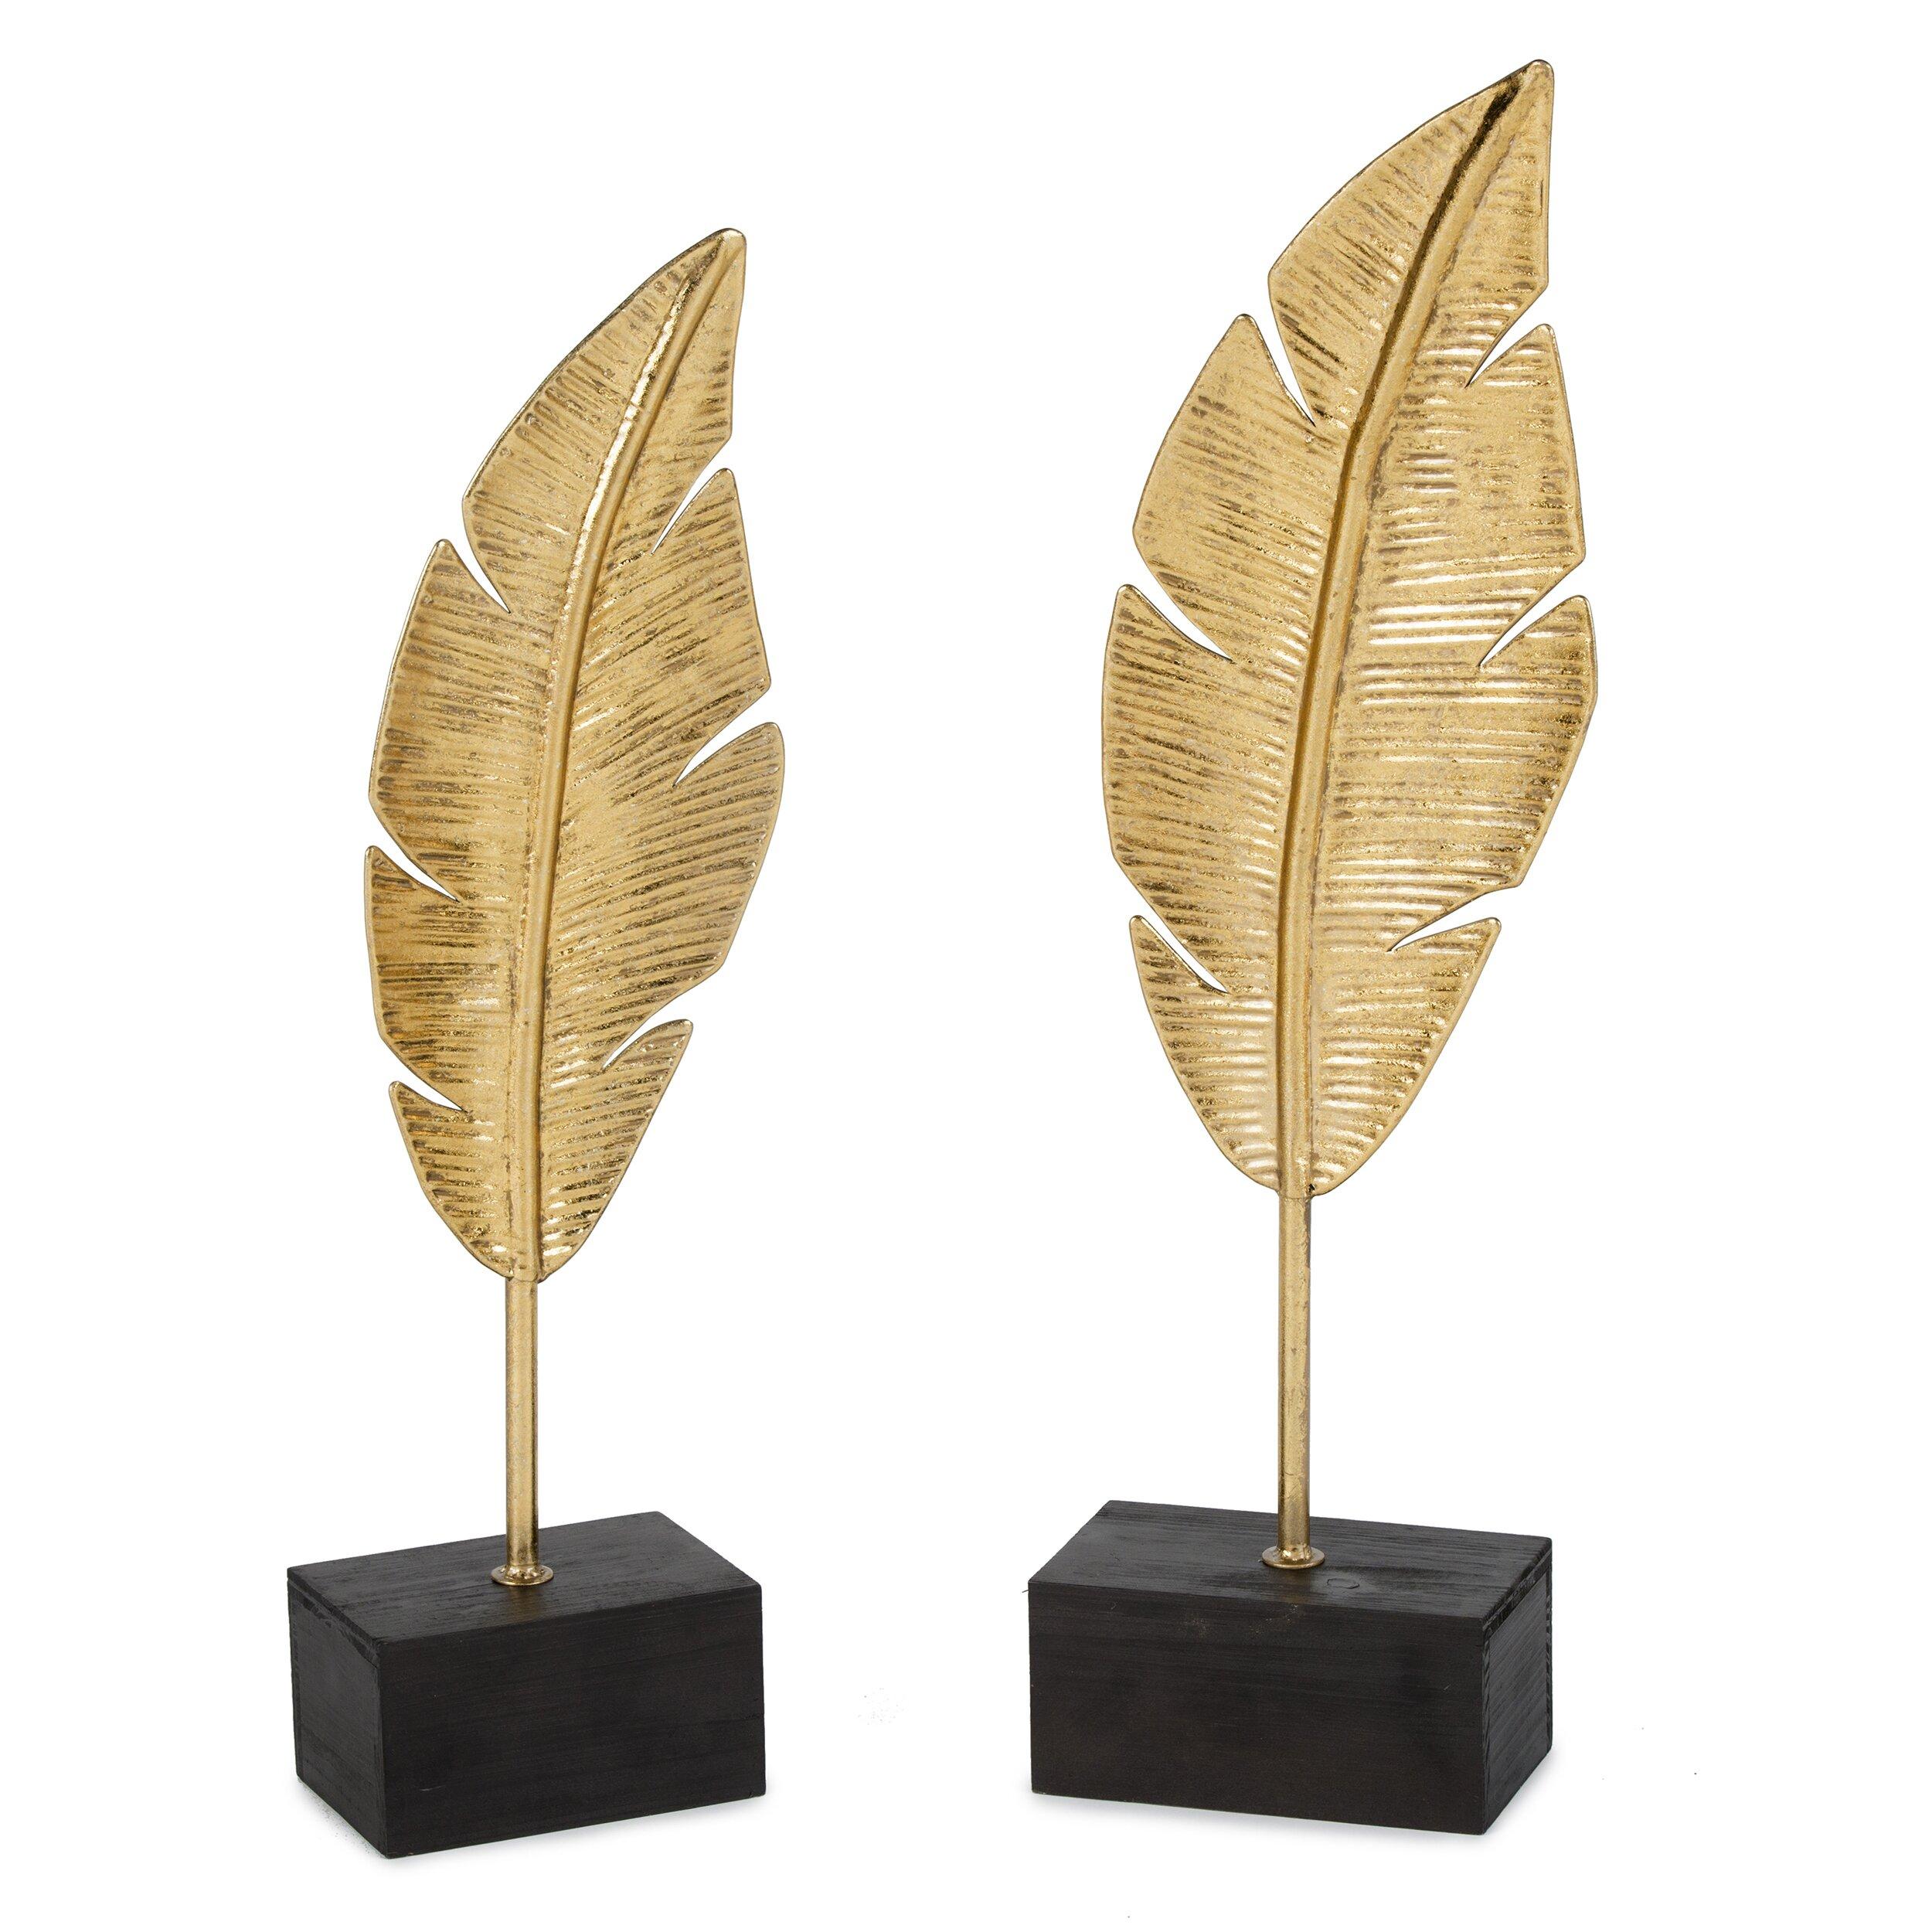 Gild Stock Quote: Gild Golden Feathers Sculpture